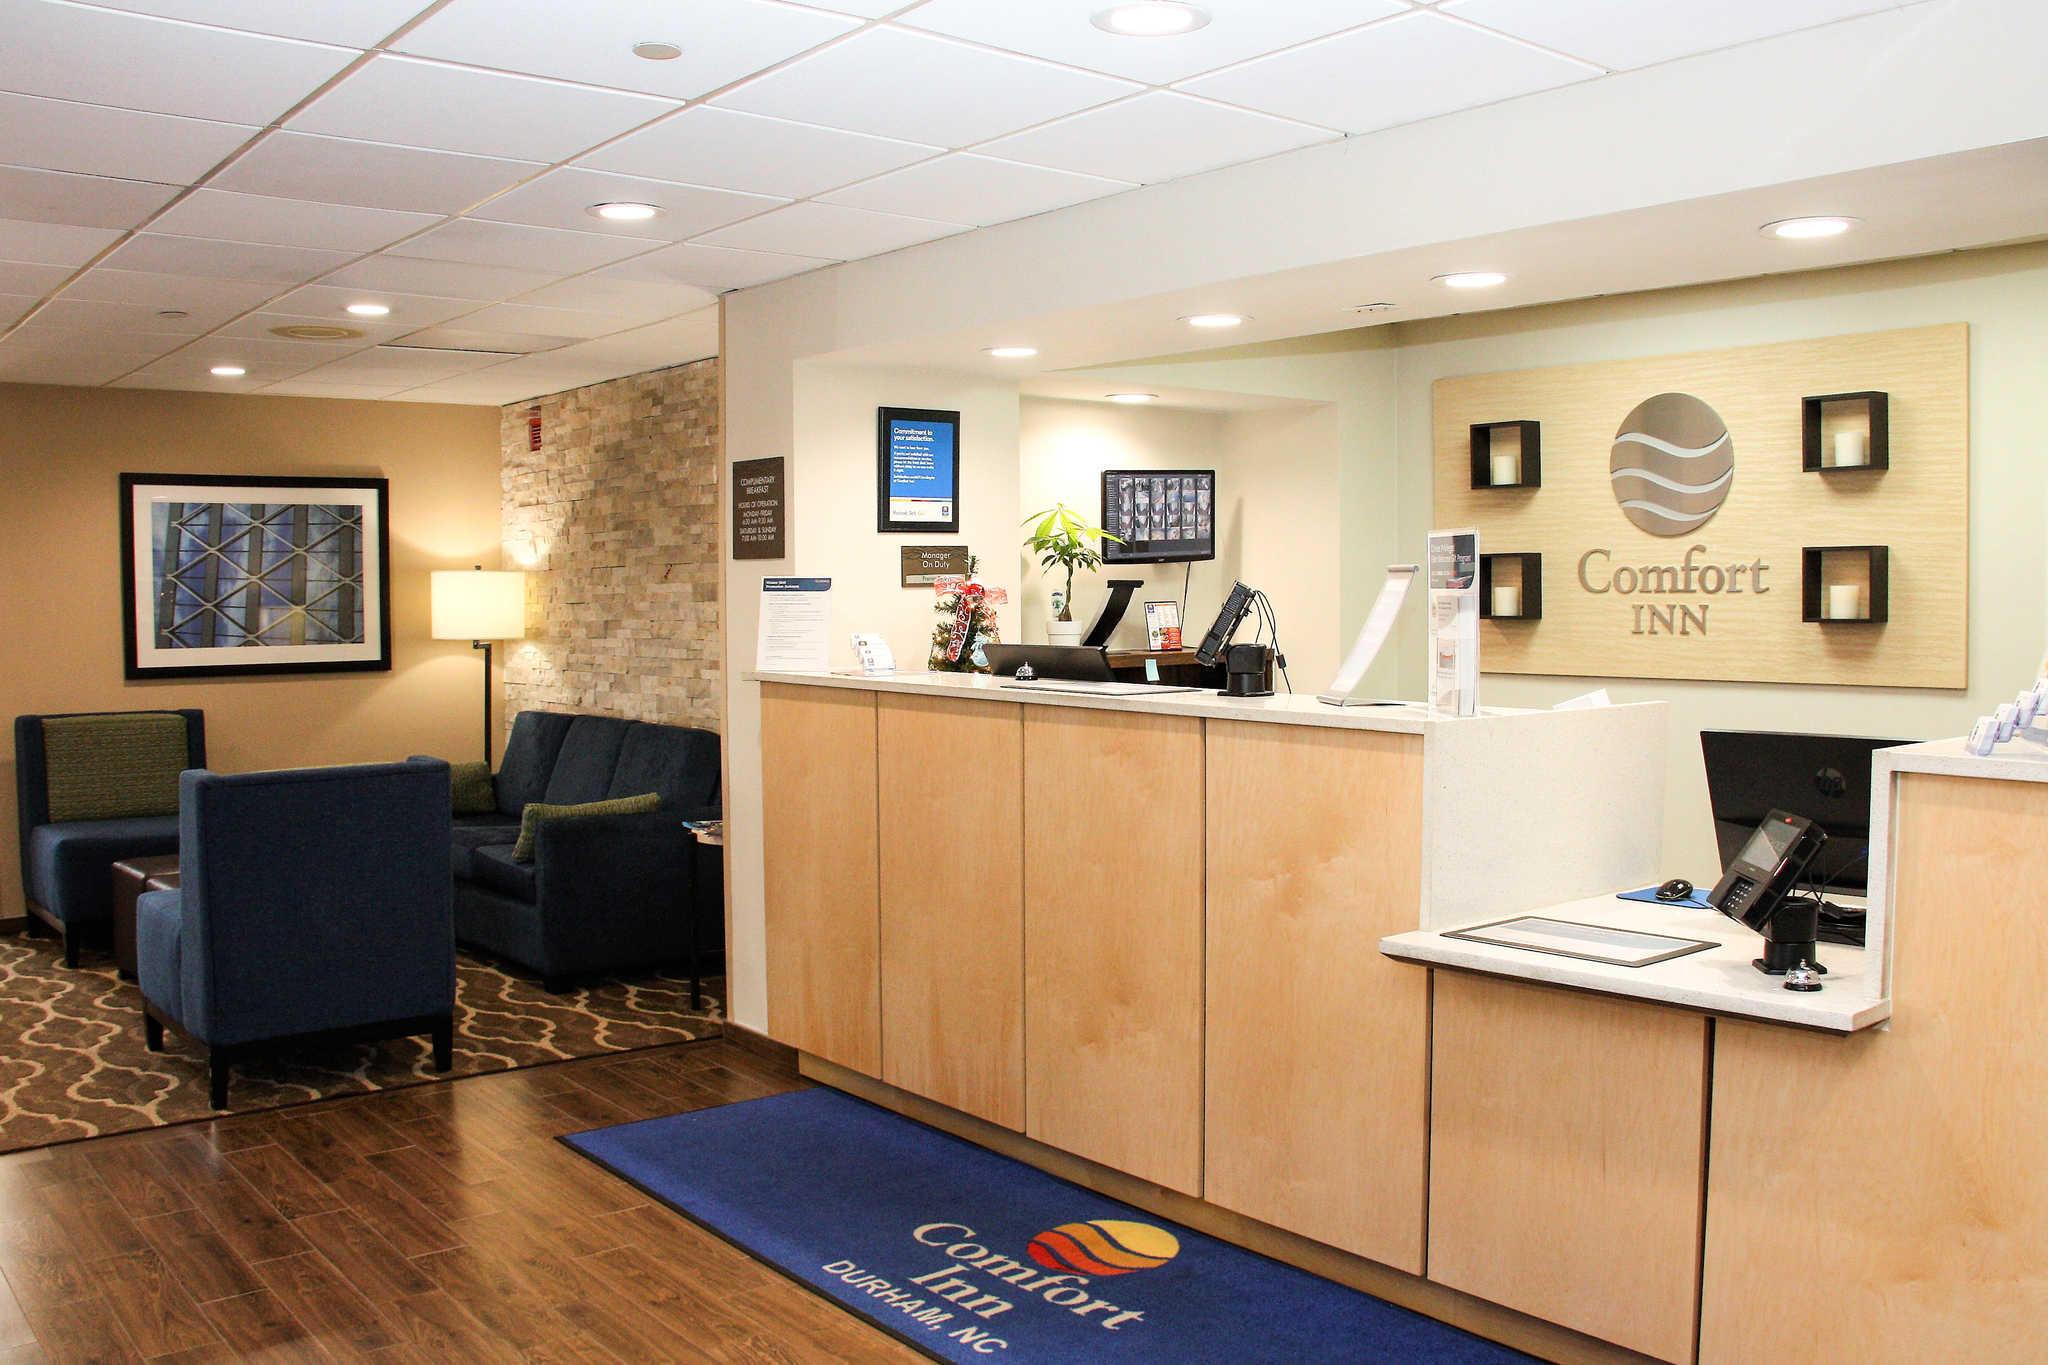 Comfort Inn & Suites Duke University-Downtown image 4